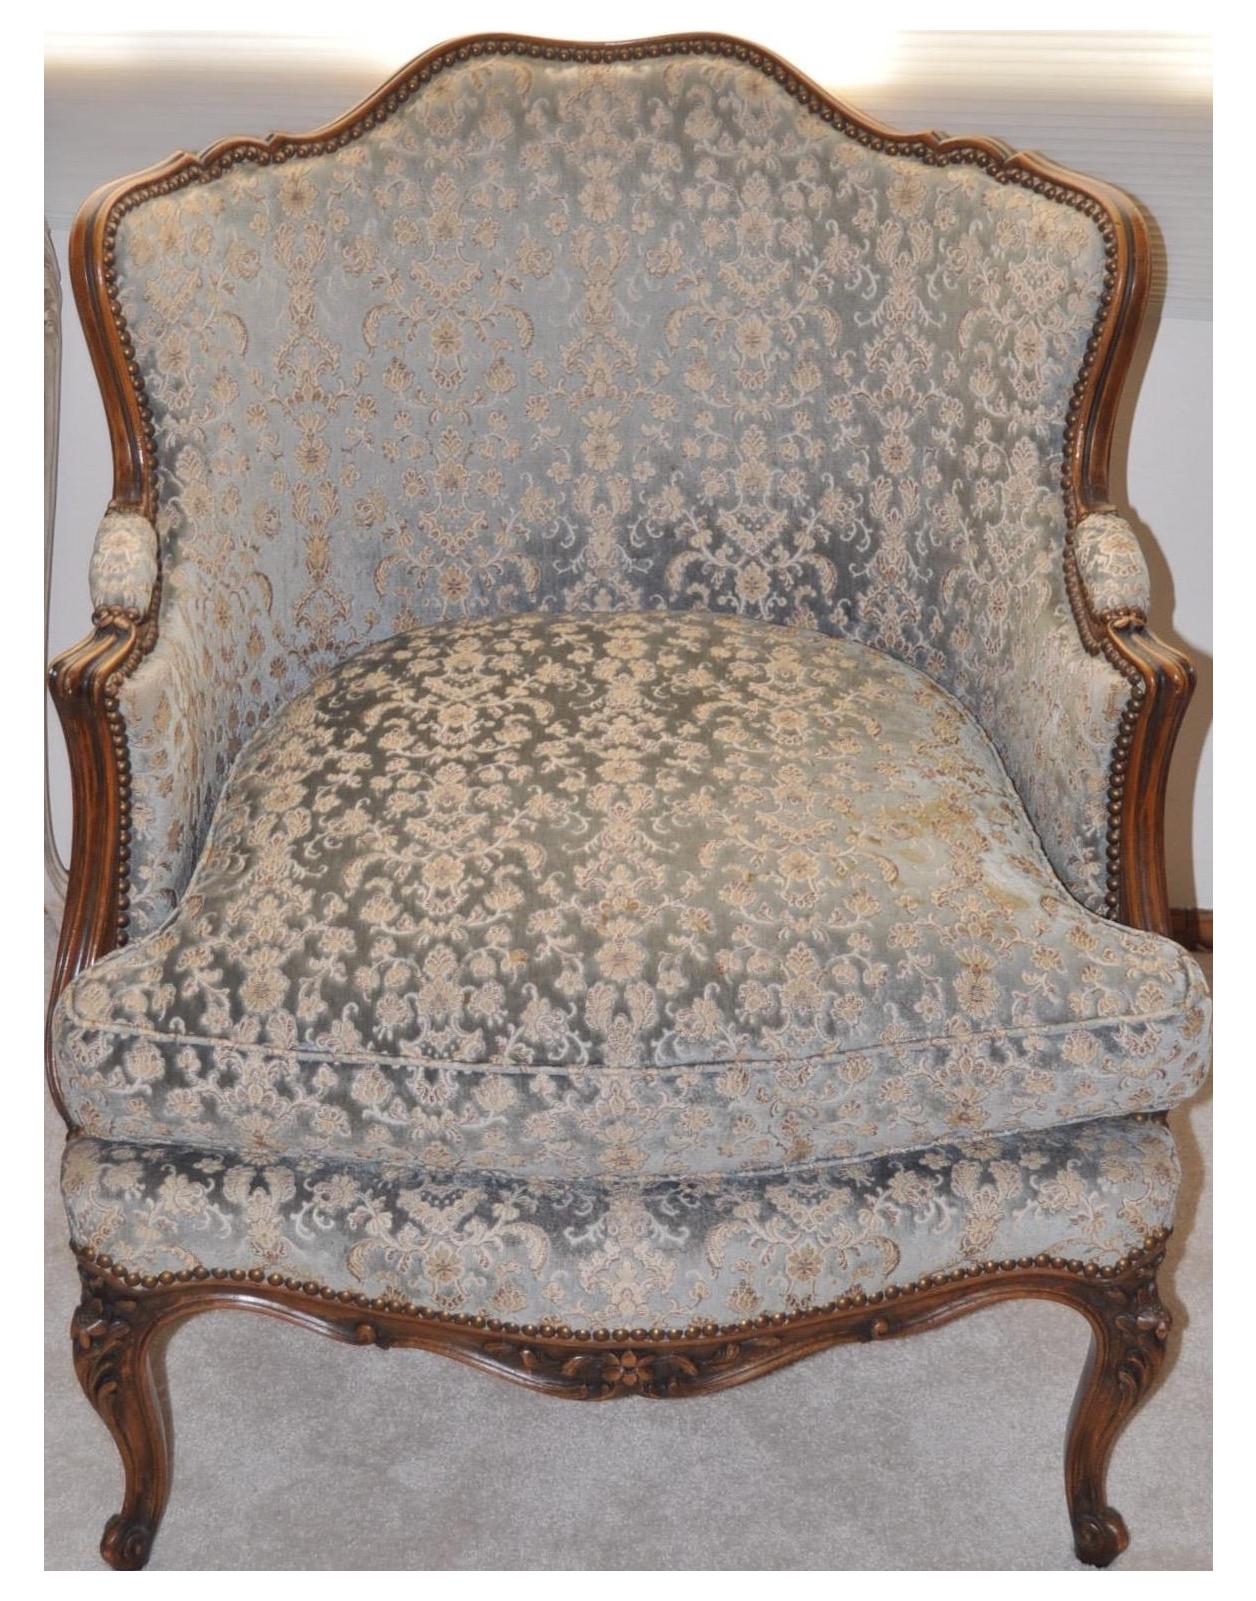 French Louis Xv Style Walnut Bergere Chair 1920 Chairish